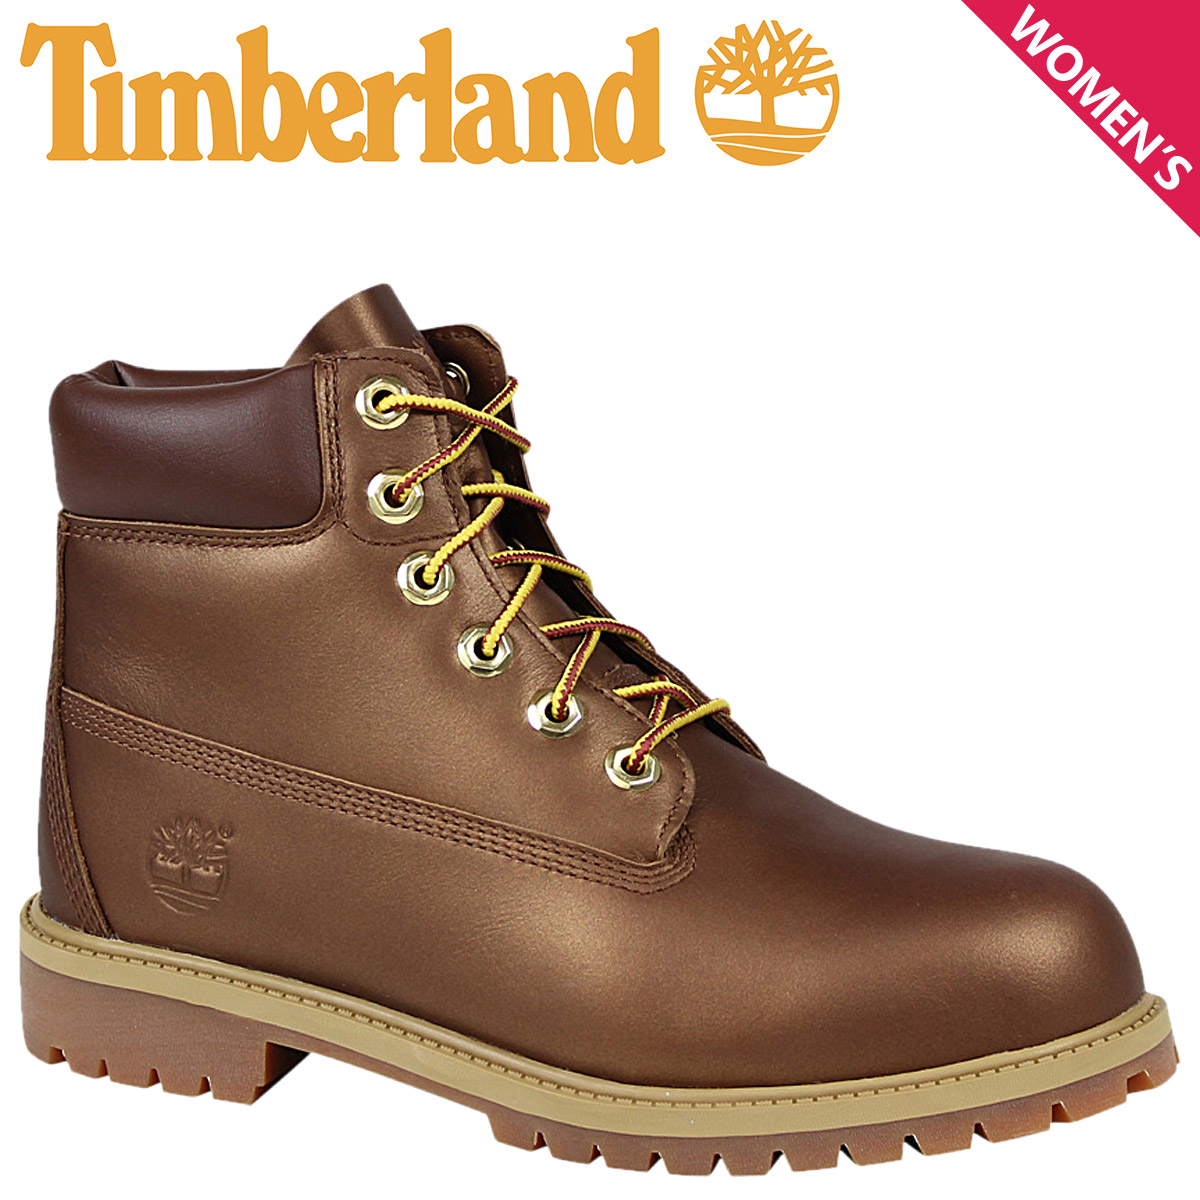 92a98fee53b5 SneaK Online Shop  Timberland Womens boots timberland 6inch premium ...